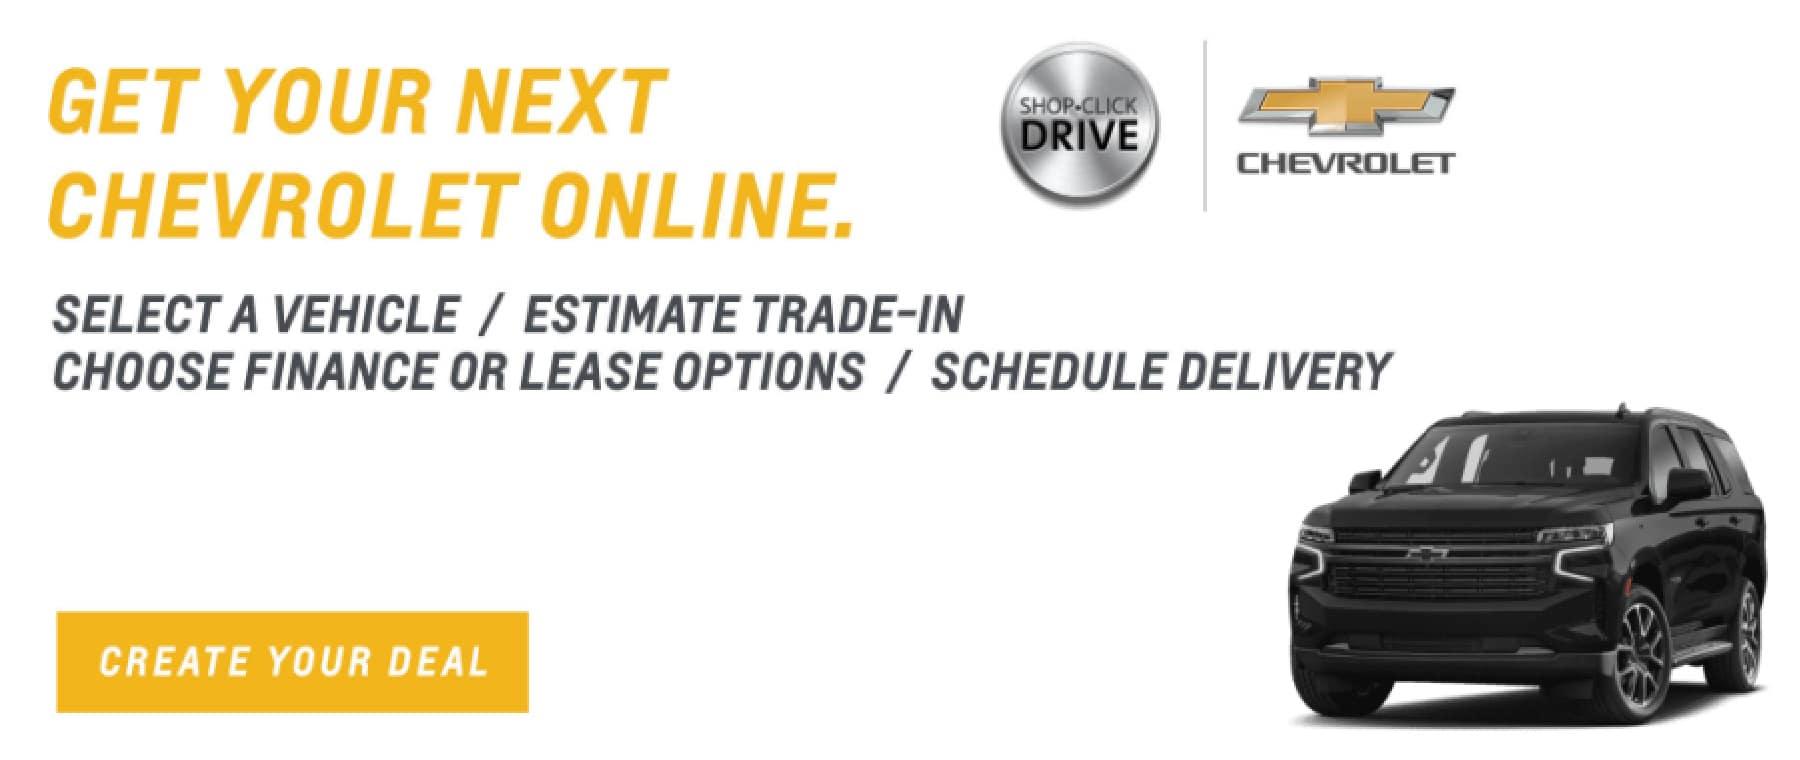 ShopClickDrive1